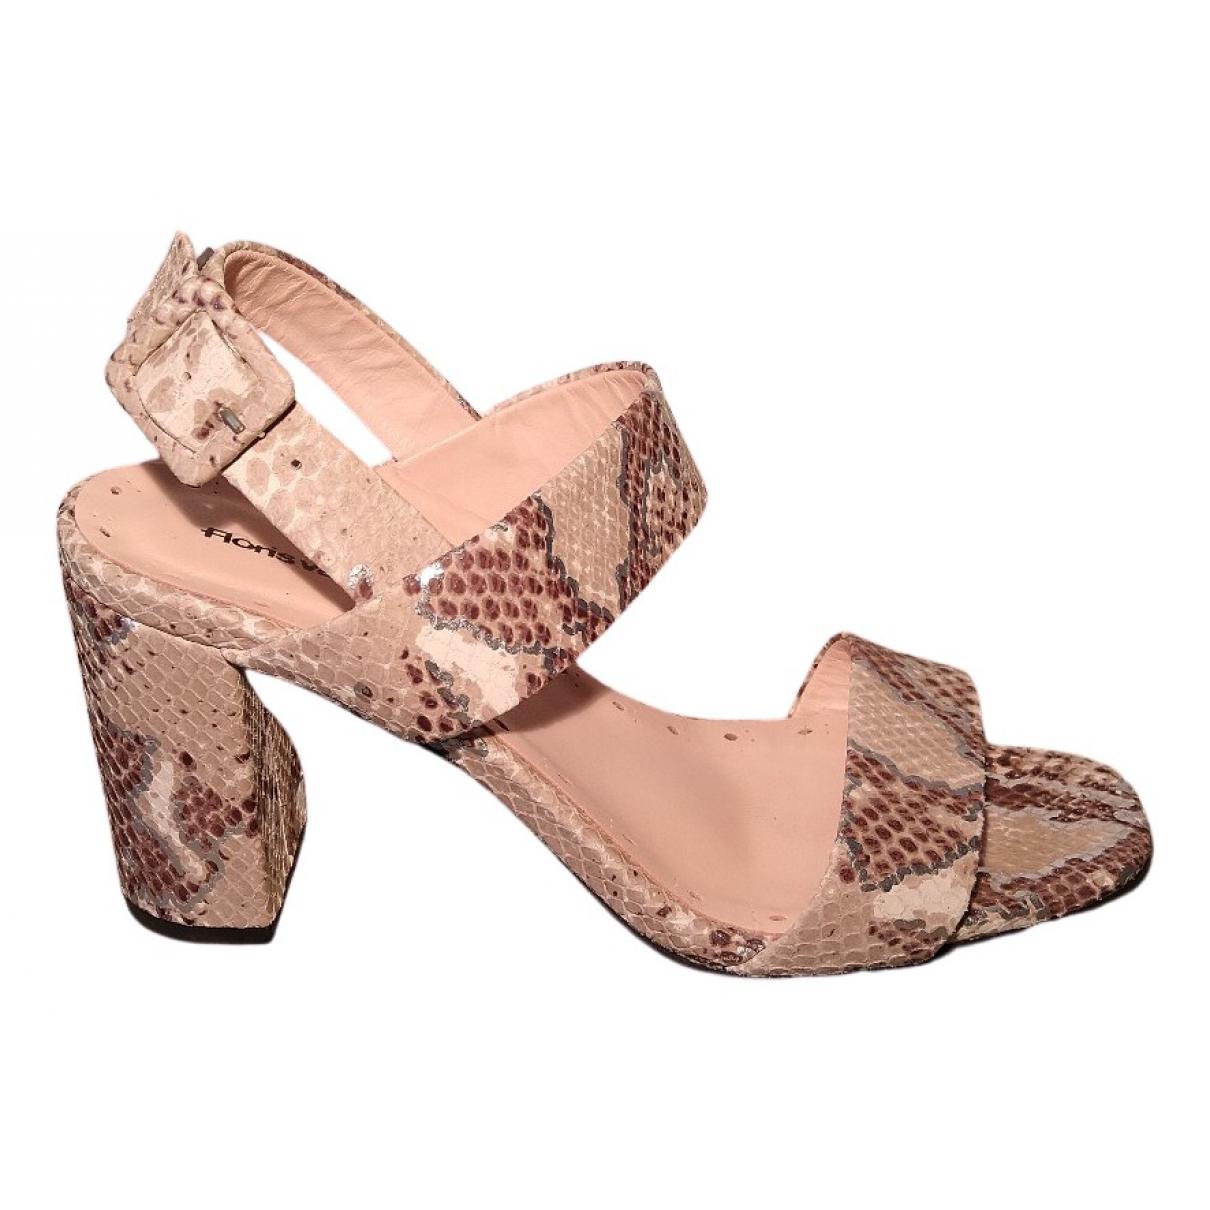 Floris Van Bommel N Grey Leather Sandals for Women 37 EU